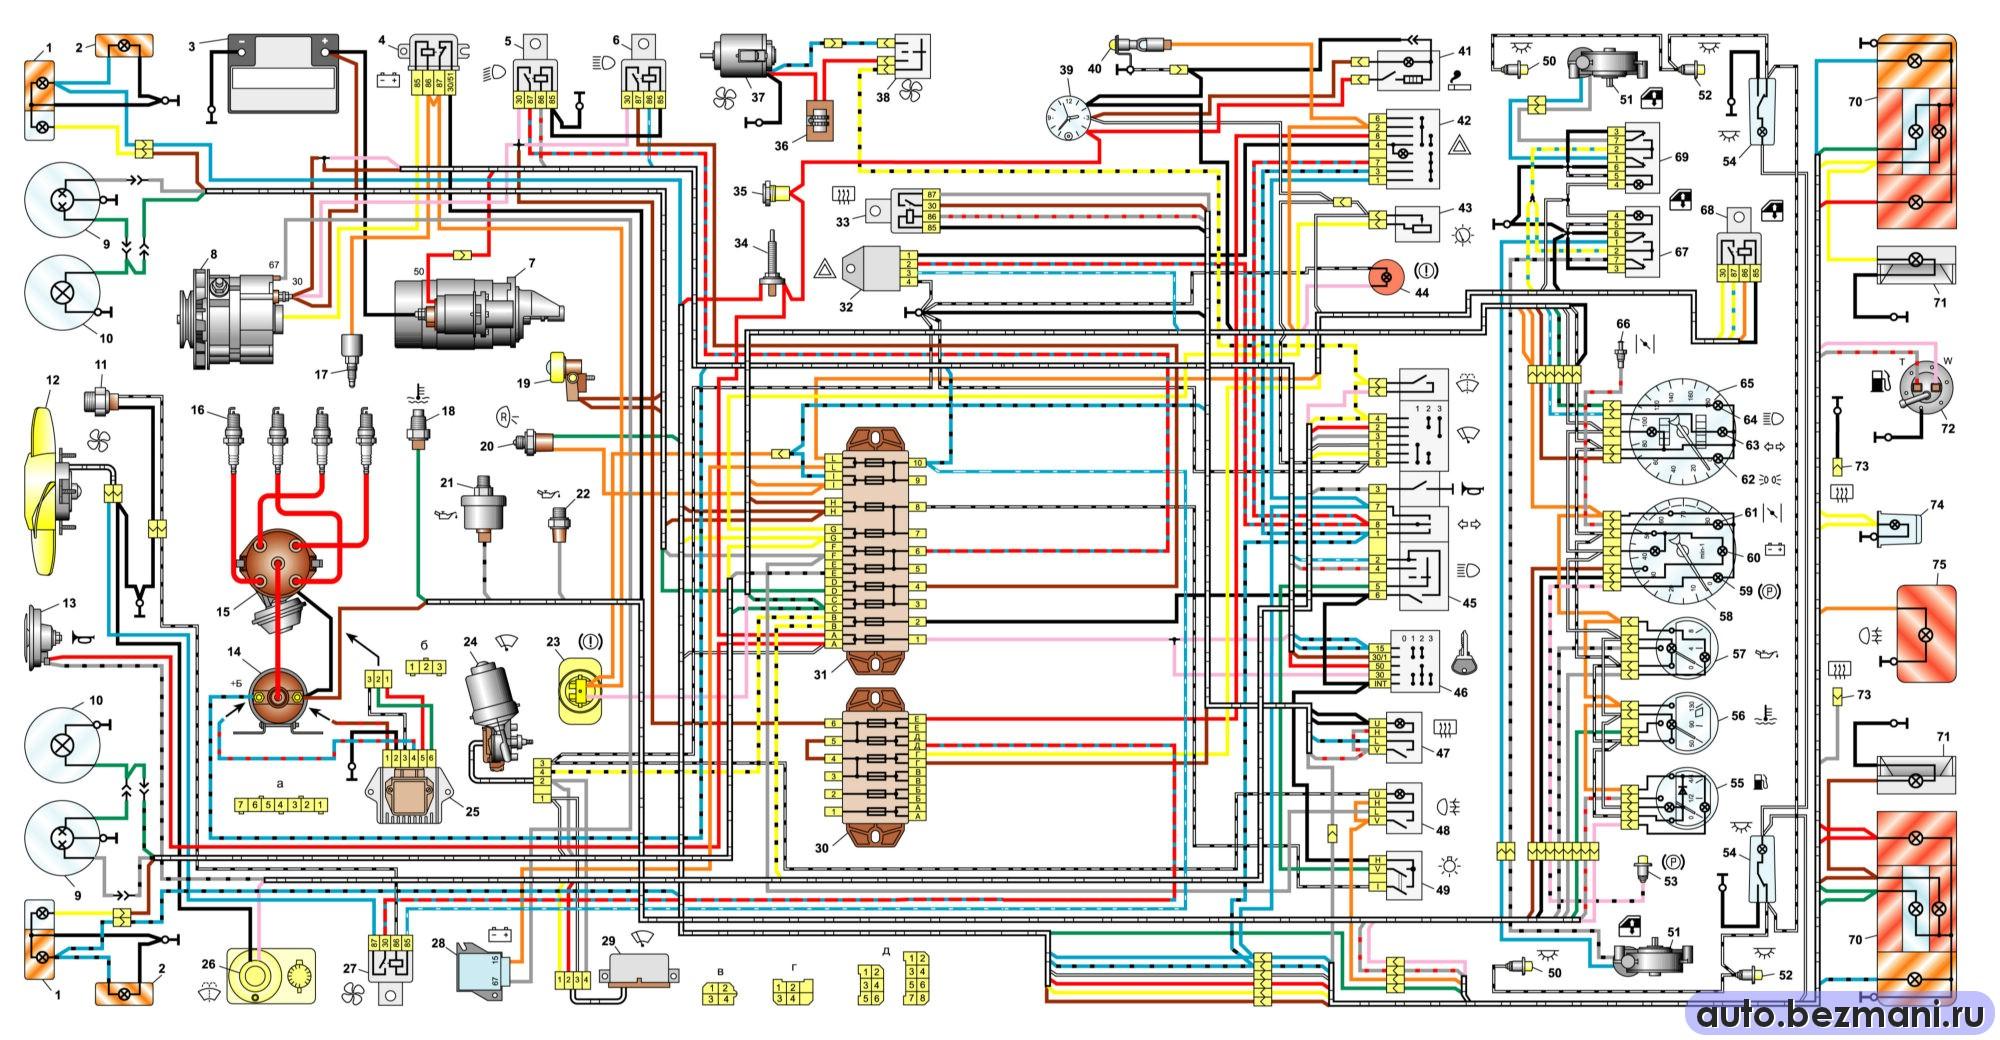 Т-72 схема электрооборудования